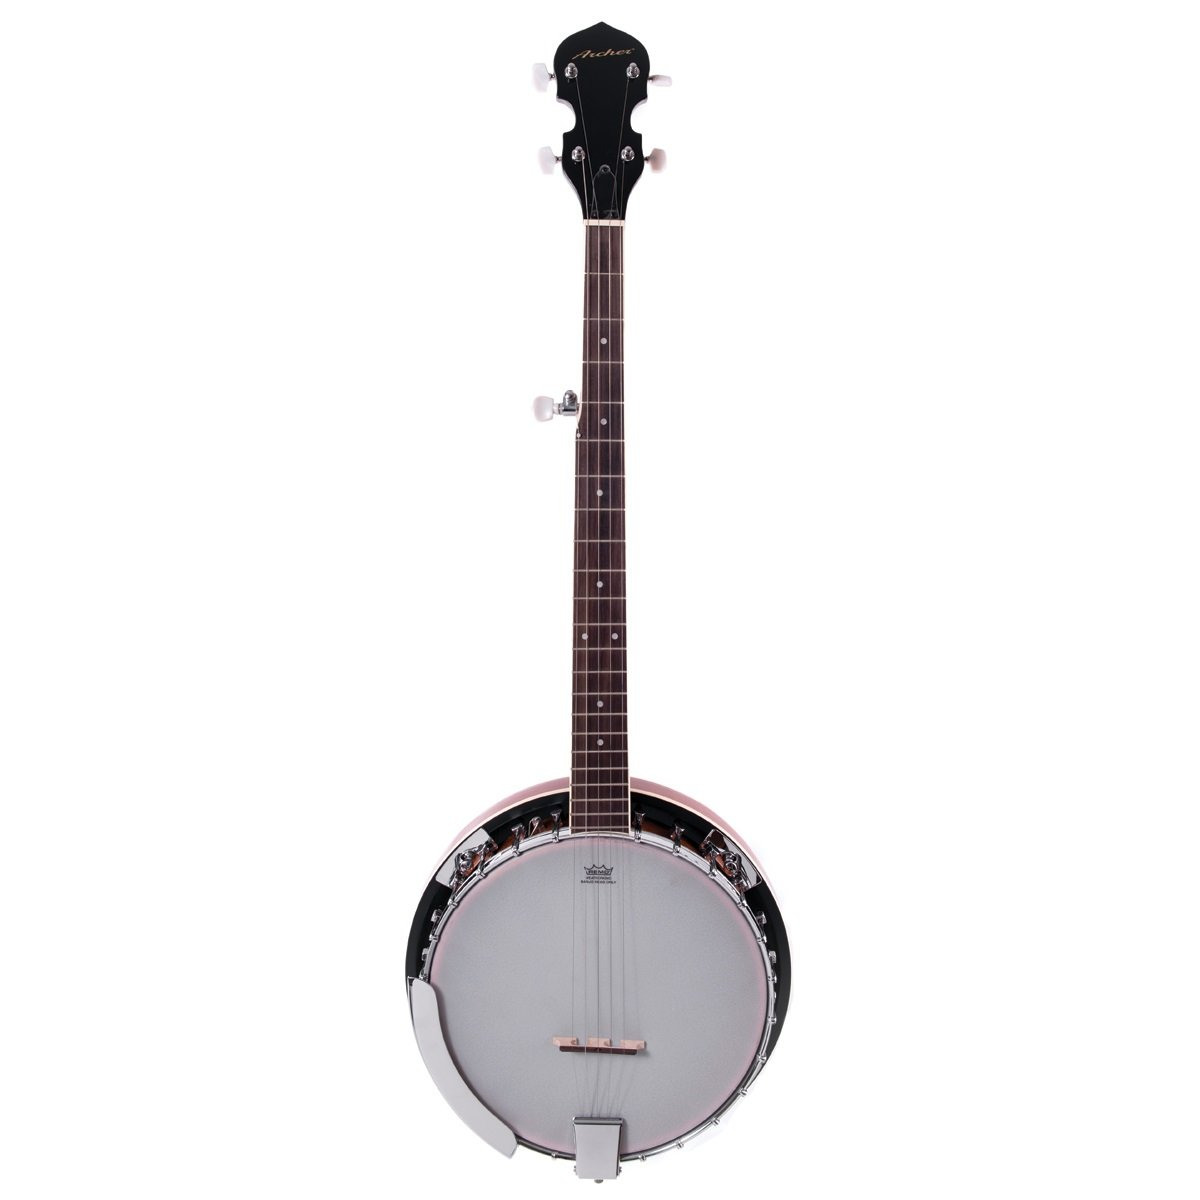 Archer BJ005 5-String Telluride Banjo Cascio Interstate Music